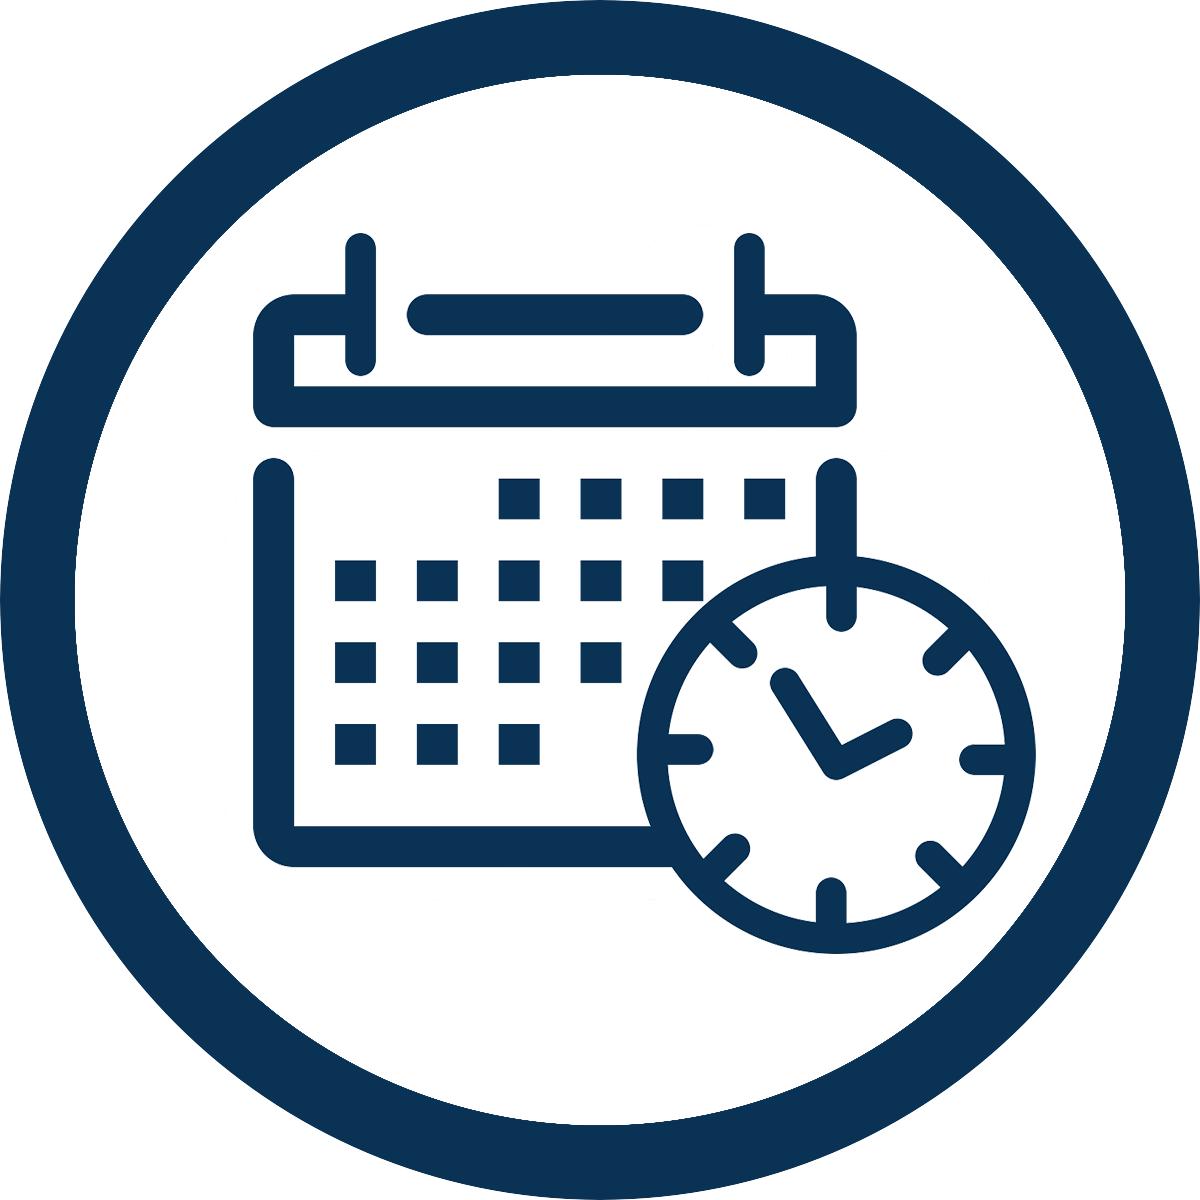 Plan your Schedule